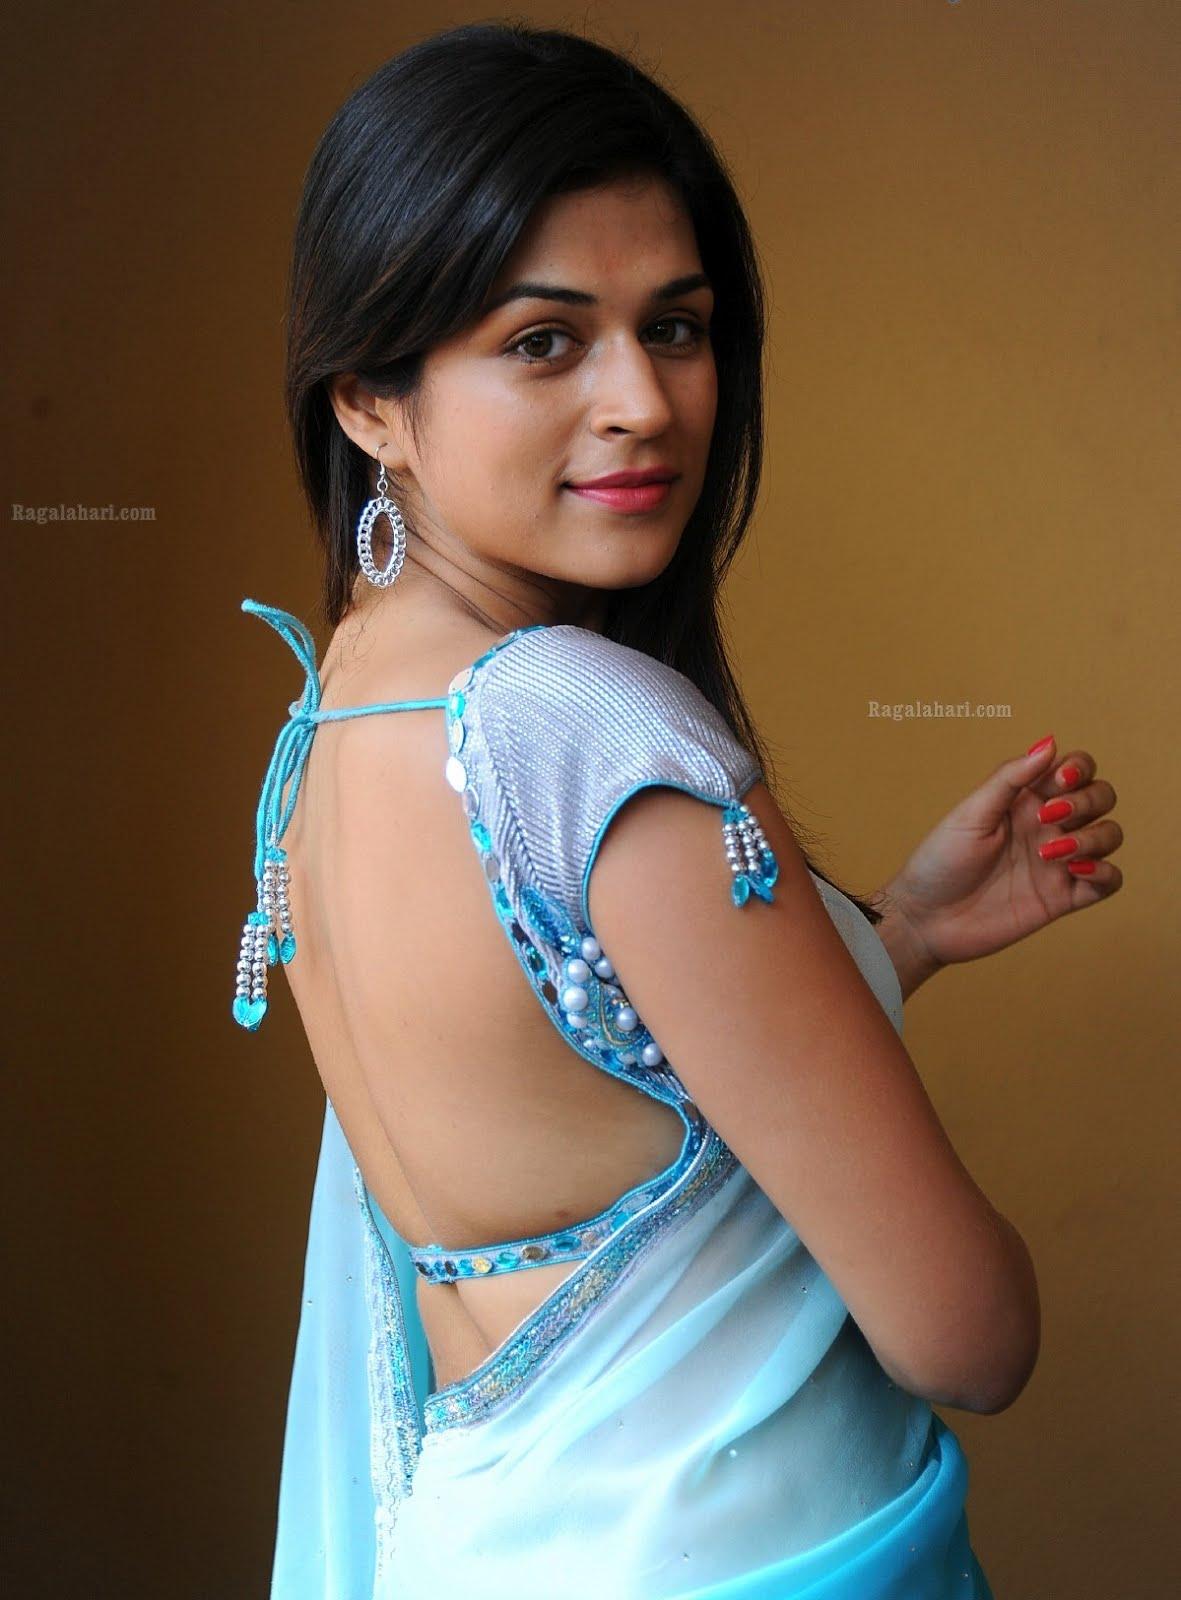 MY COUNTRY ACTRESS: Shraddha Das Hot in Blue Saree